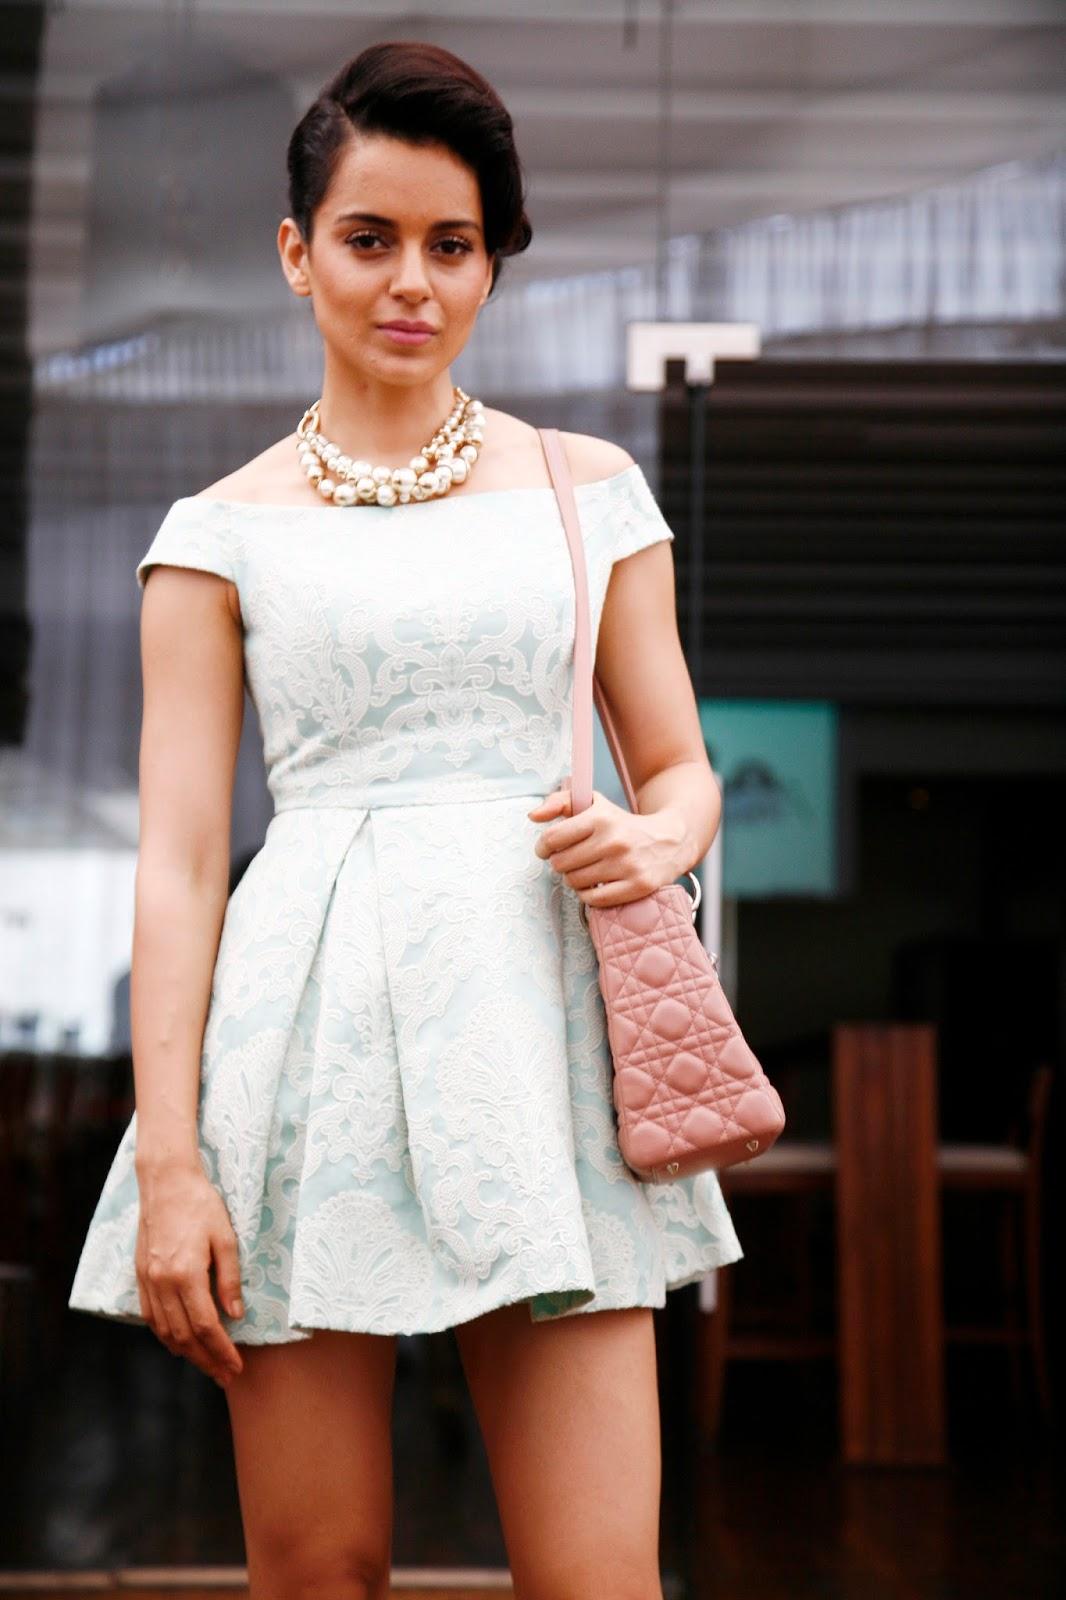 http://4.bp.blogspot.com/-35akiF6zQWA/UislojisW1I/AAAAAAAAbl0/4p2ERkoevew/s1600/Kangana+Ranaut+Launches+Her+Website+(6).JPG